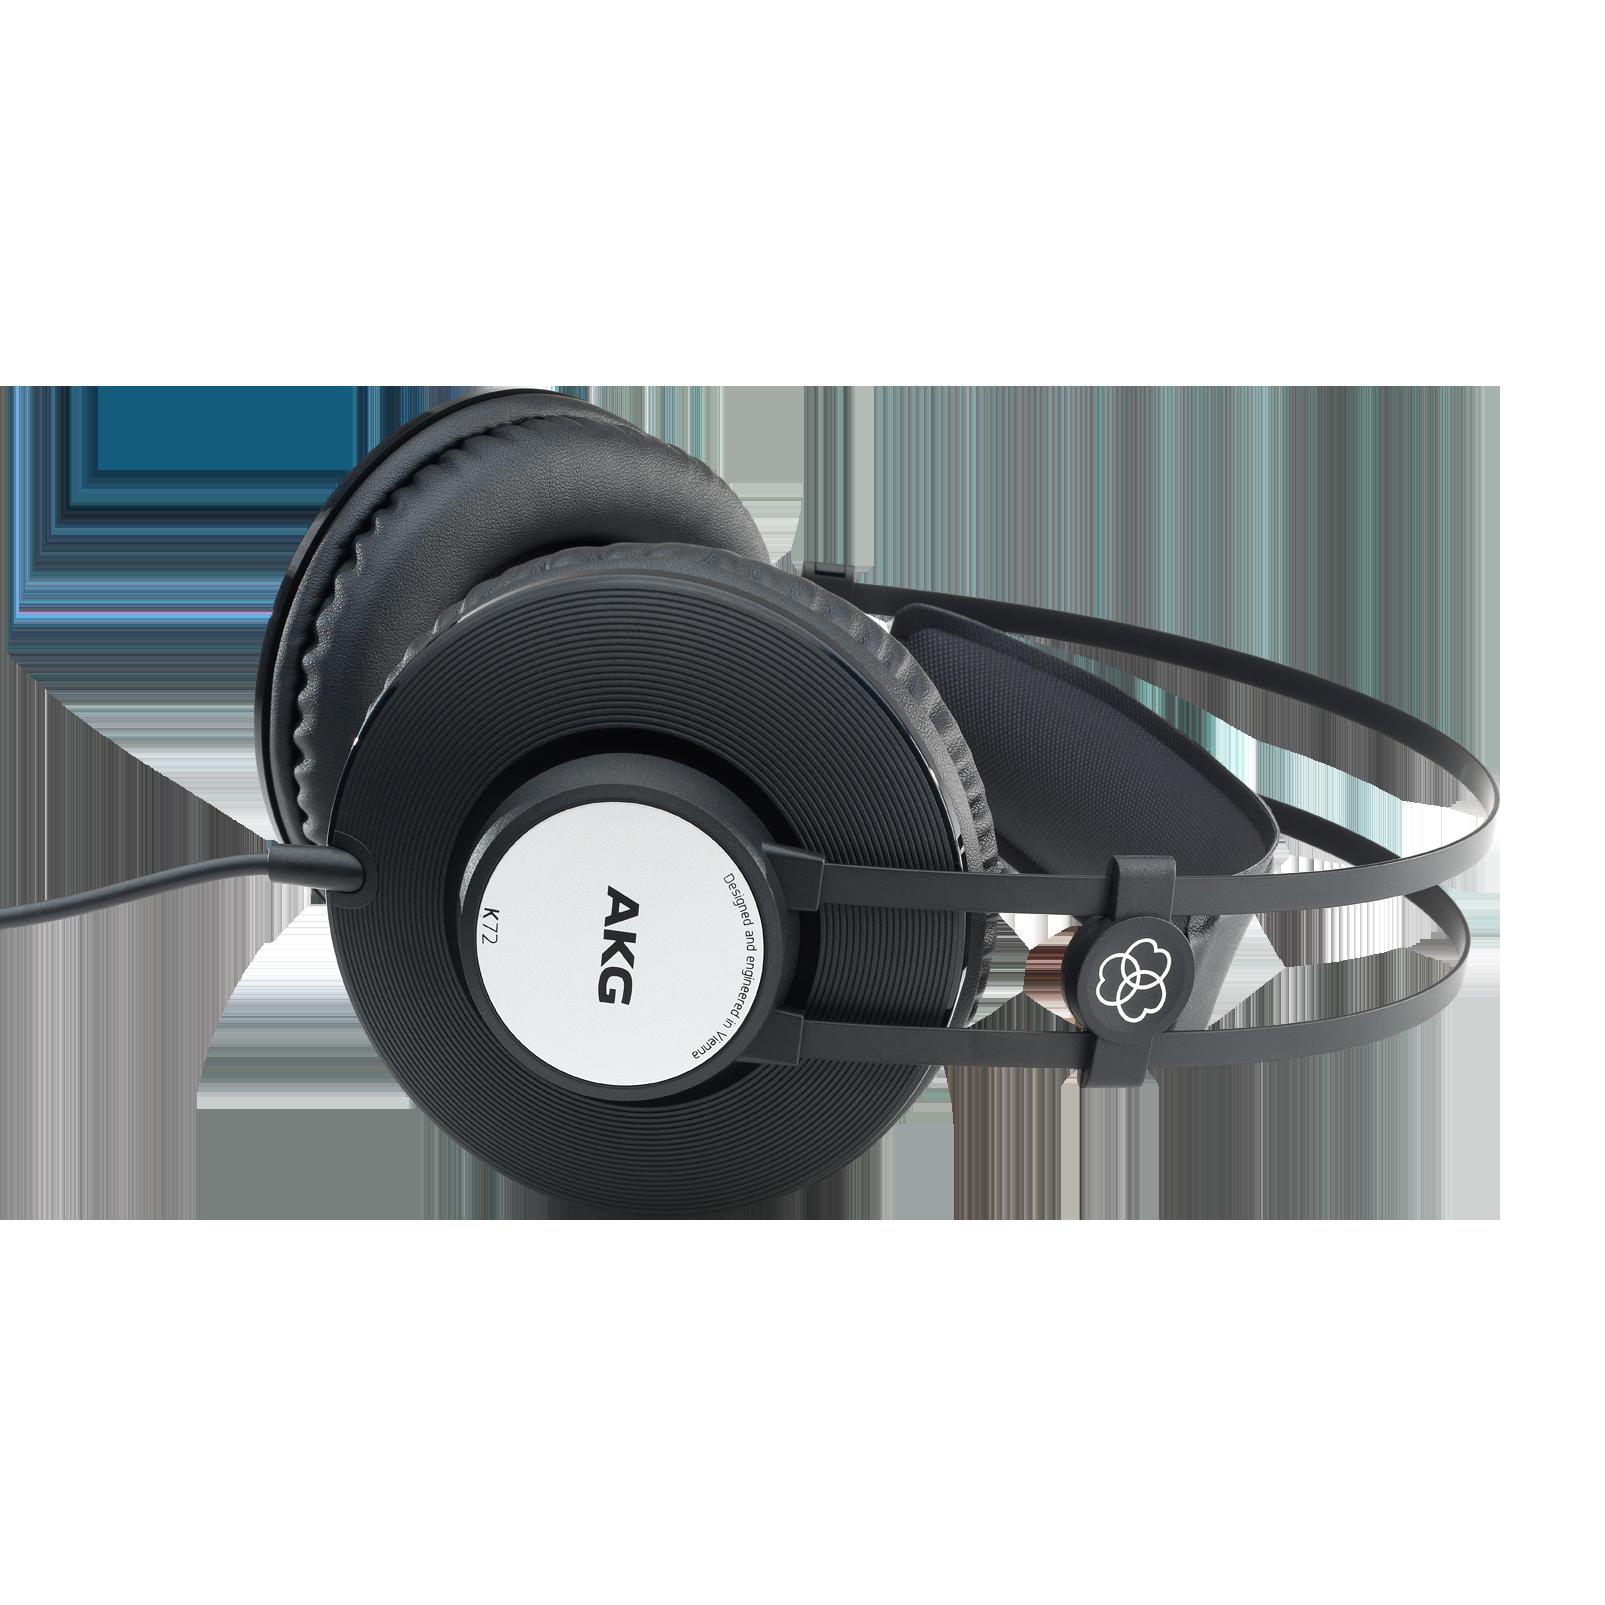 K72 - Black - Closed-back studio headphones - Detailshot 3